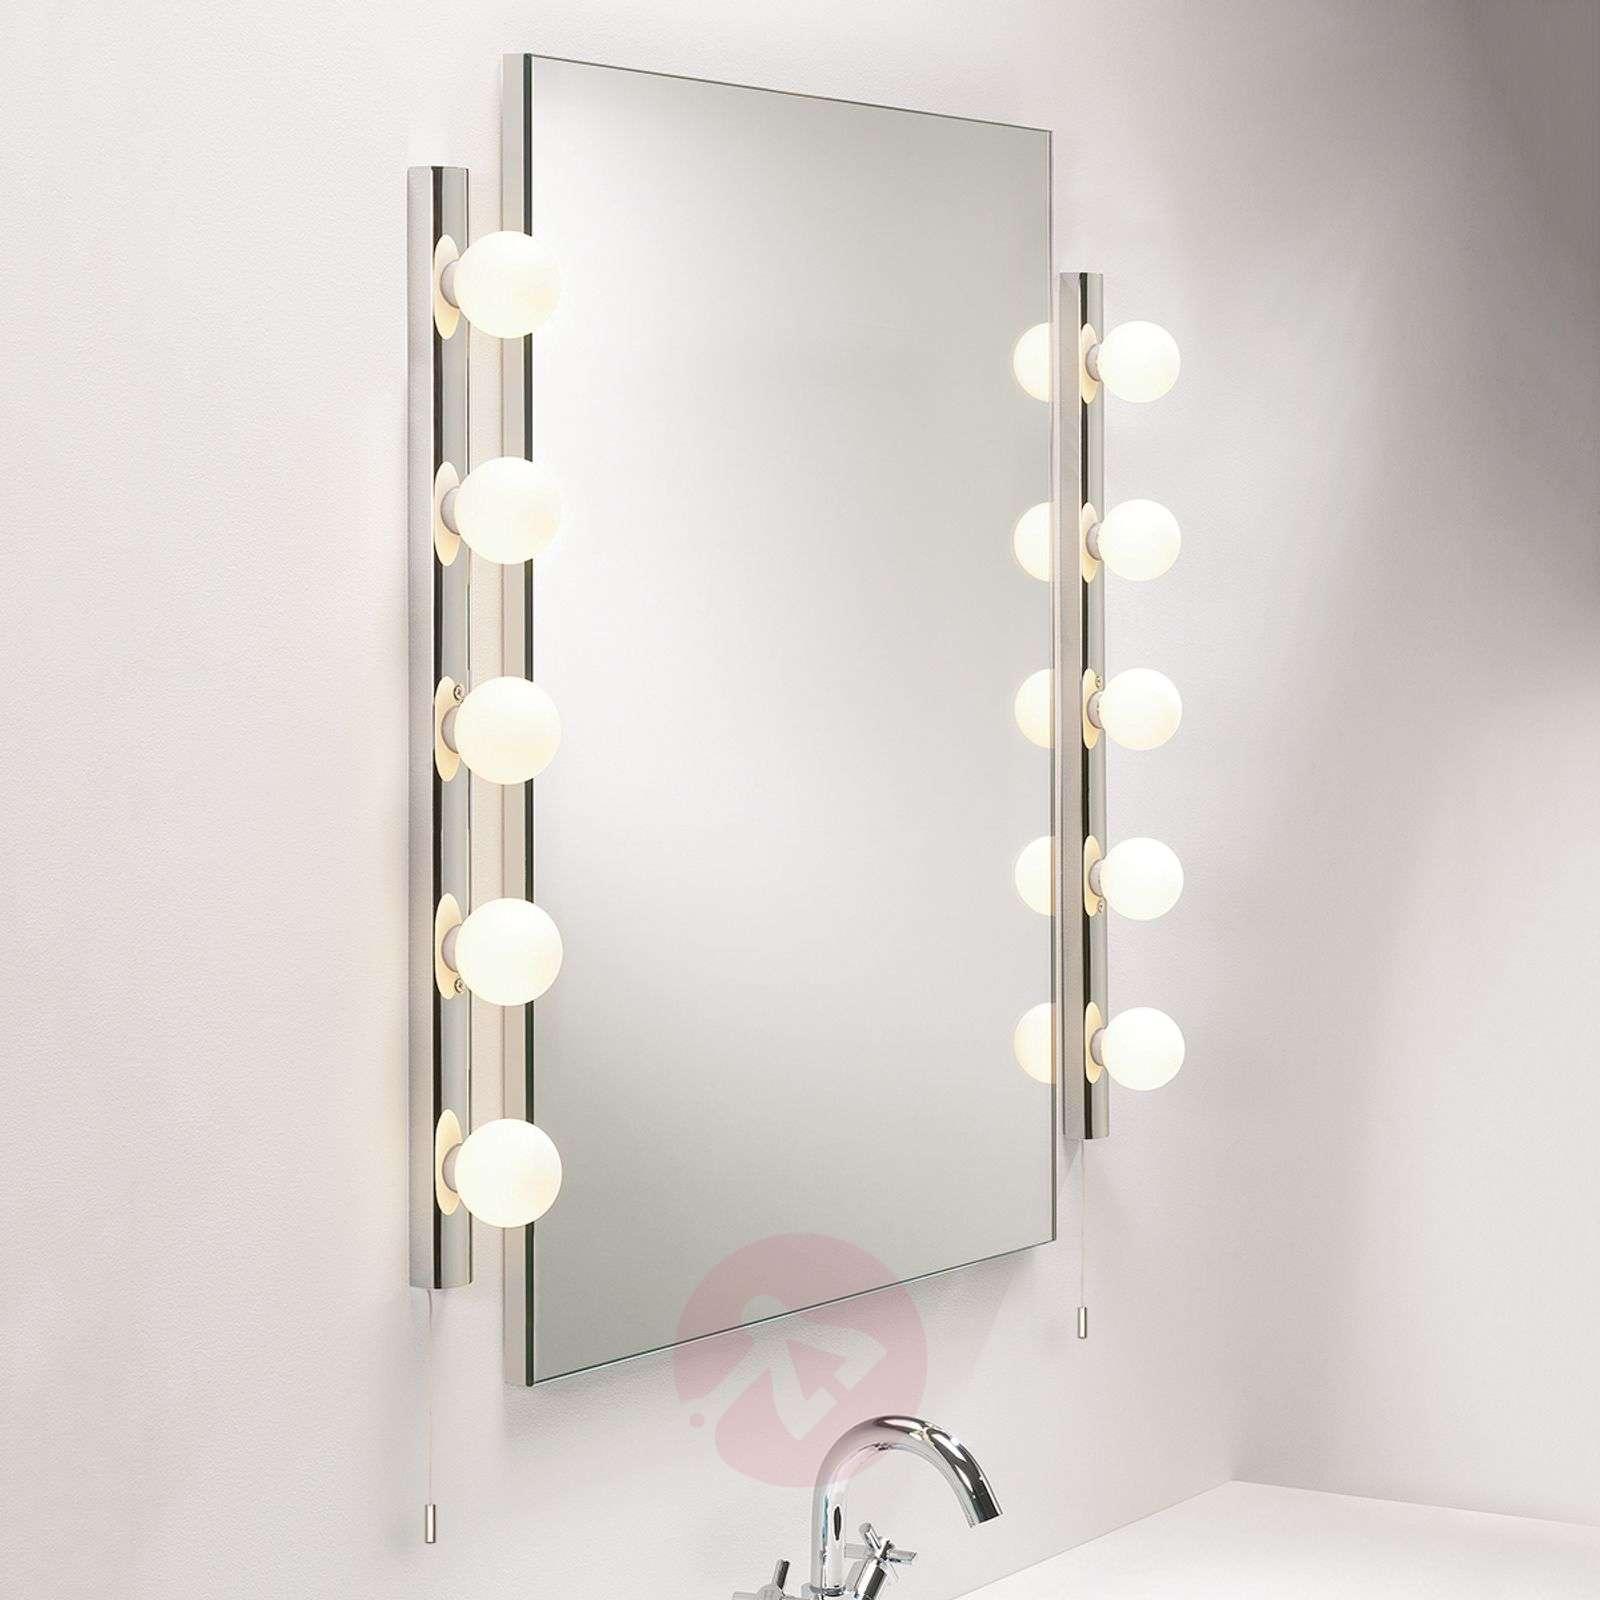 Cabaret 5 Mirror Wall Light Classic-1020371-01